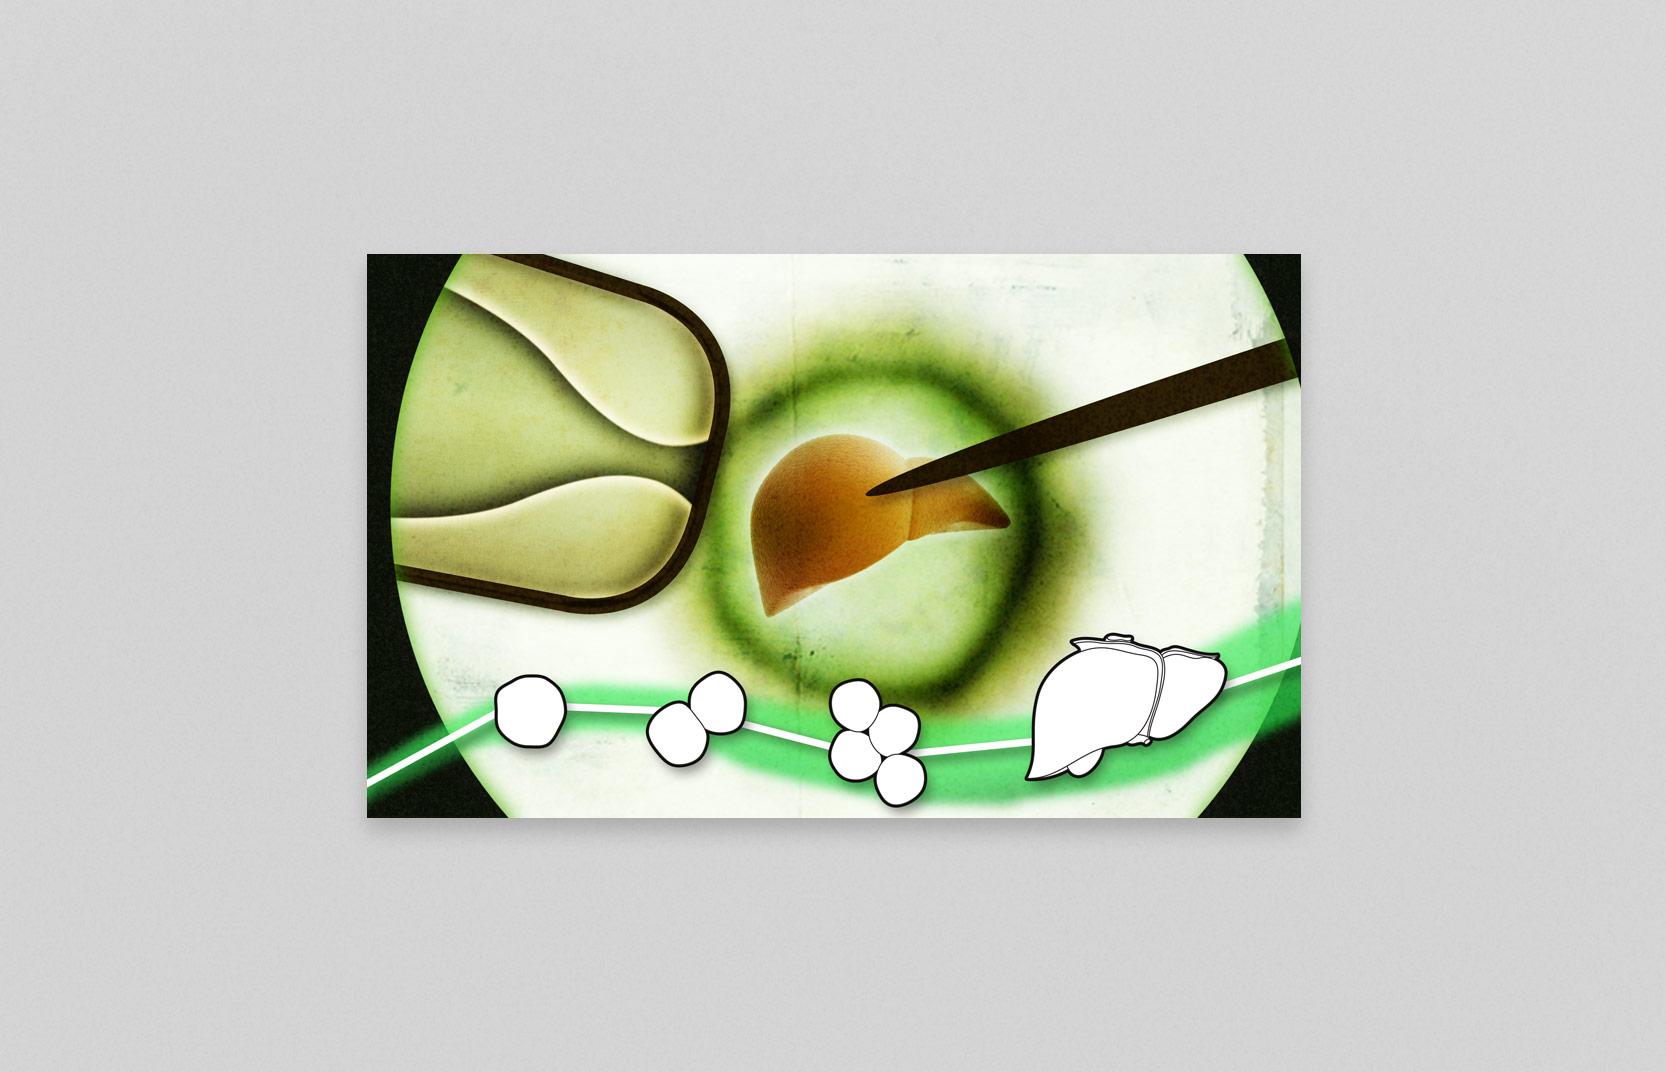 HD llustratie Nederlandse transplantatie stichting - Moederschip 2014